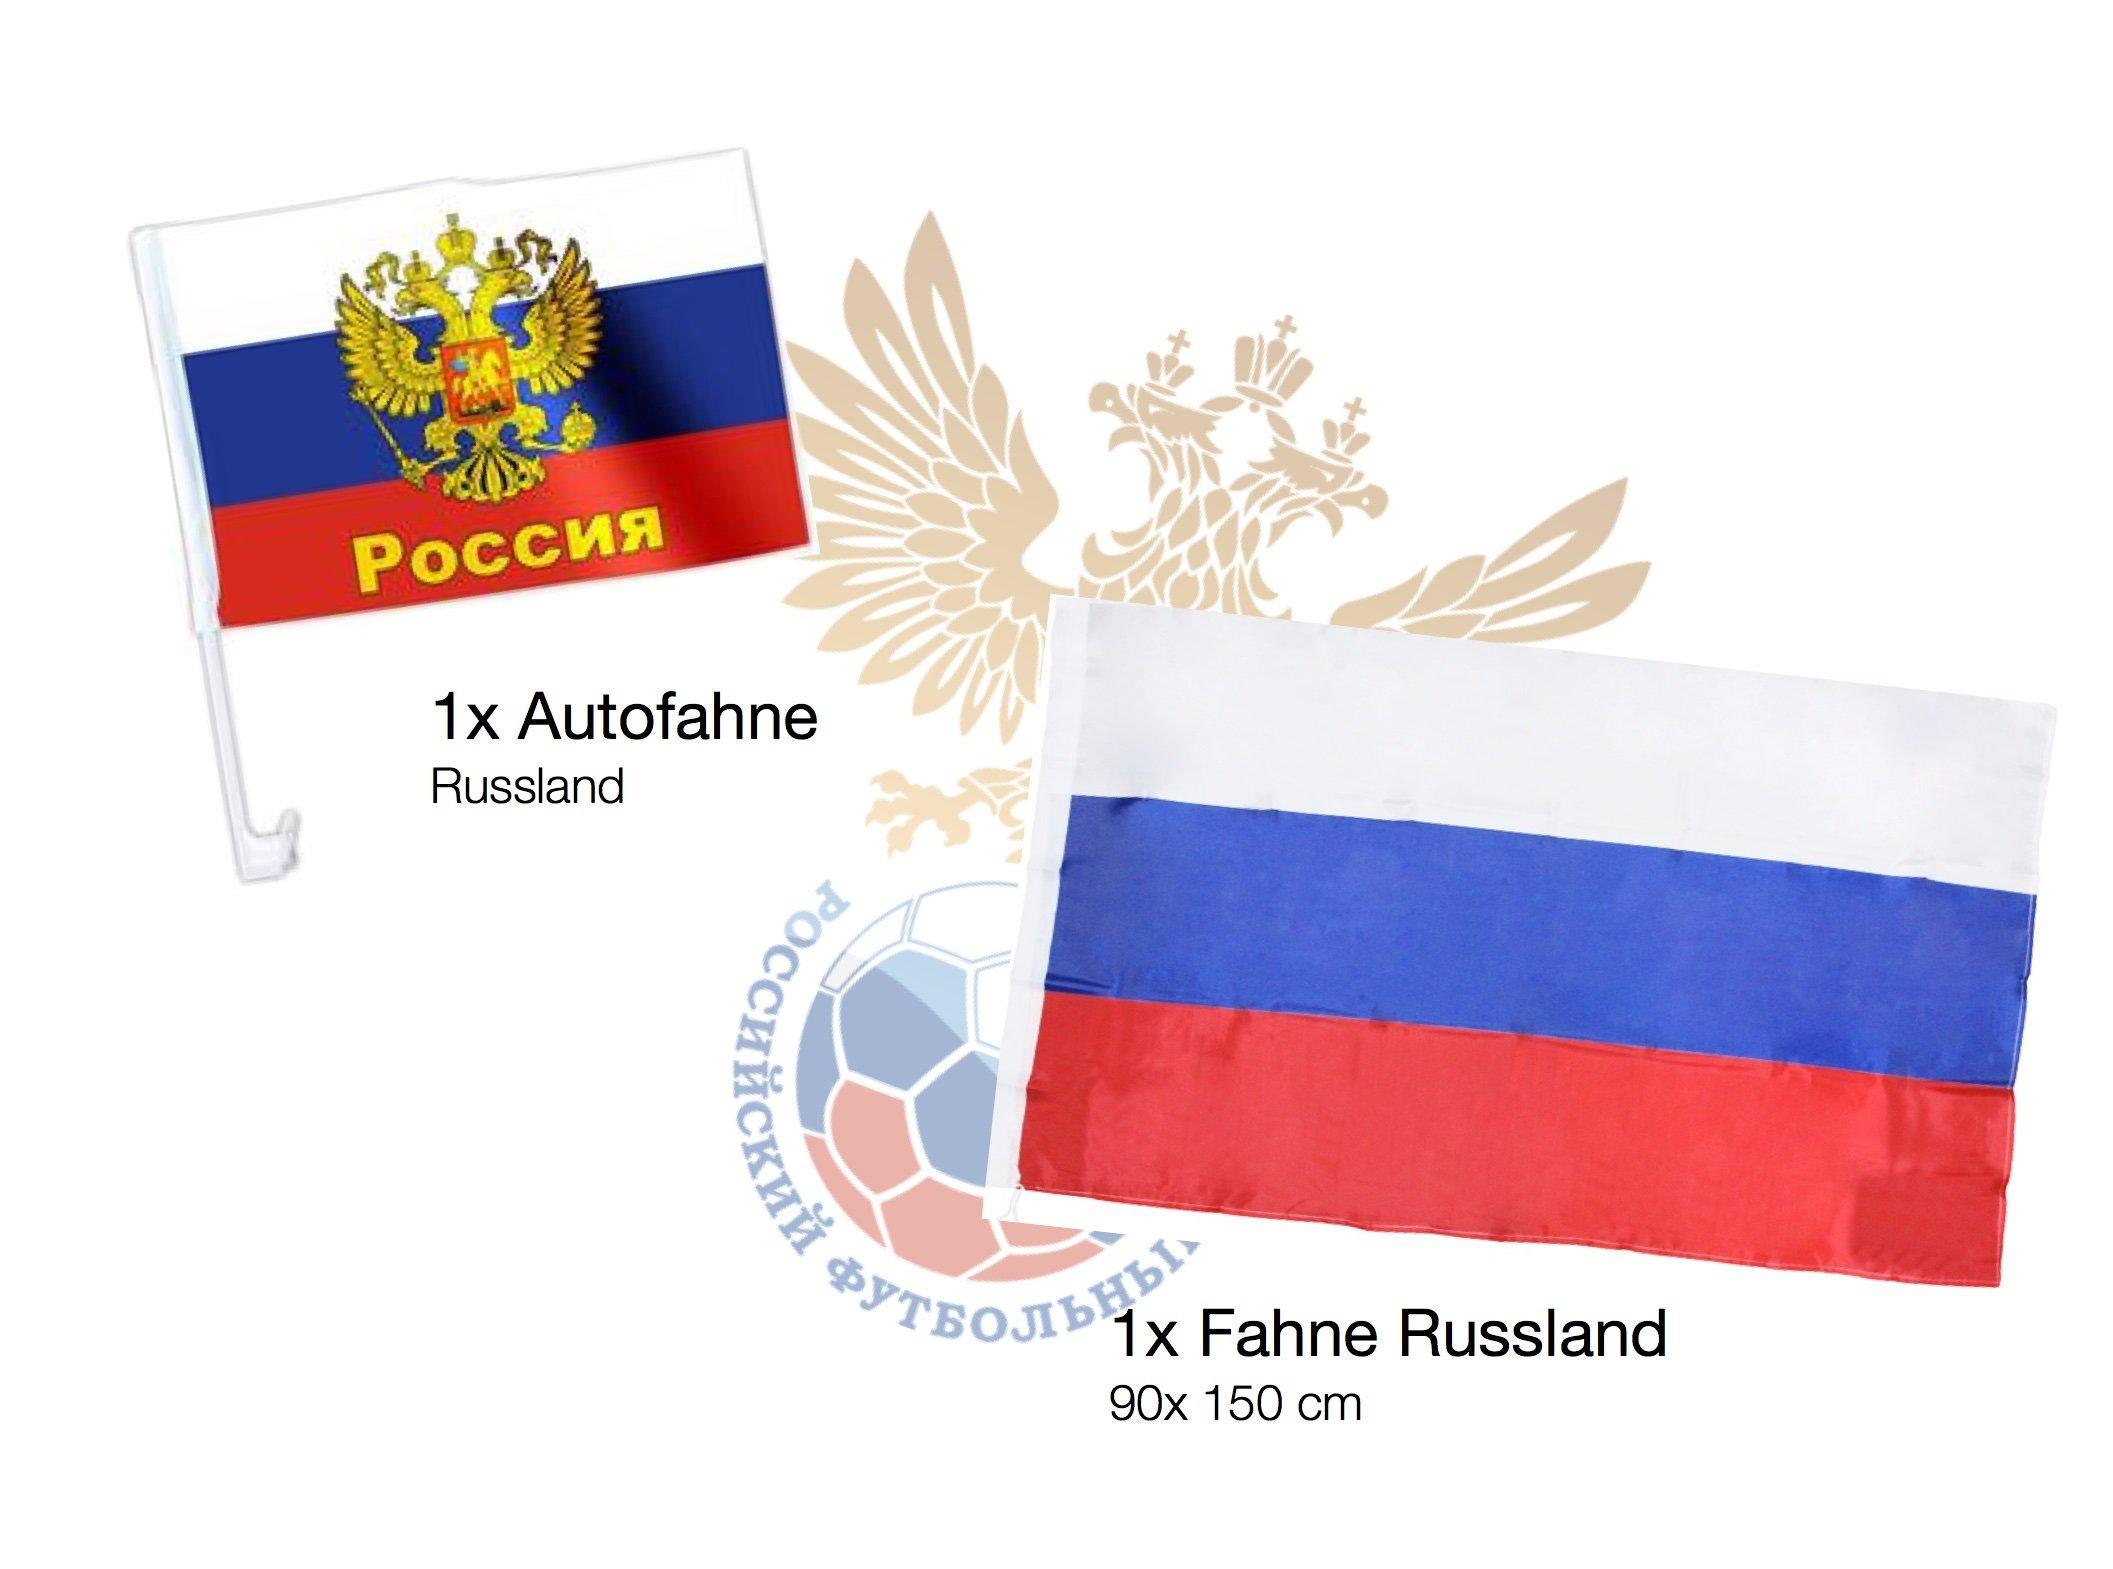 XXL Fanset Russland 1x Russlandfahne Russlandflagge Fahne Flagge 1x Blumenkette blau, weiß, rot, 1x Fantröte Tröte, 1x…